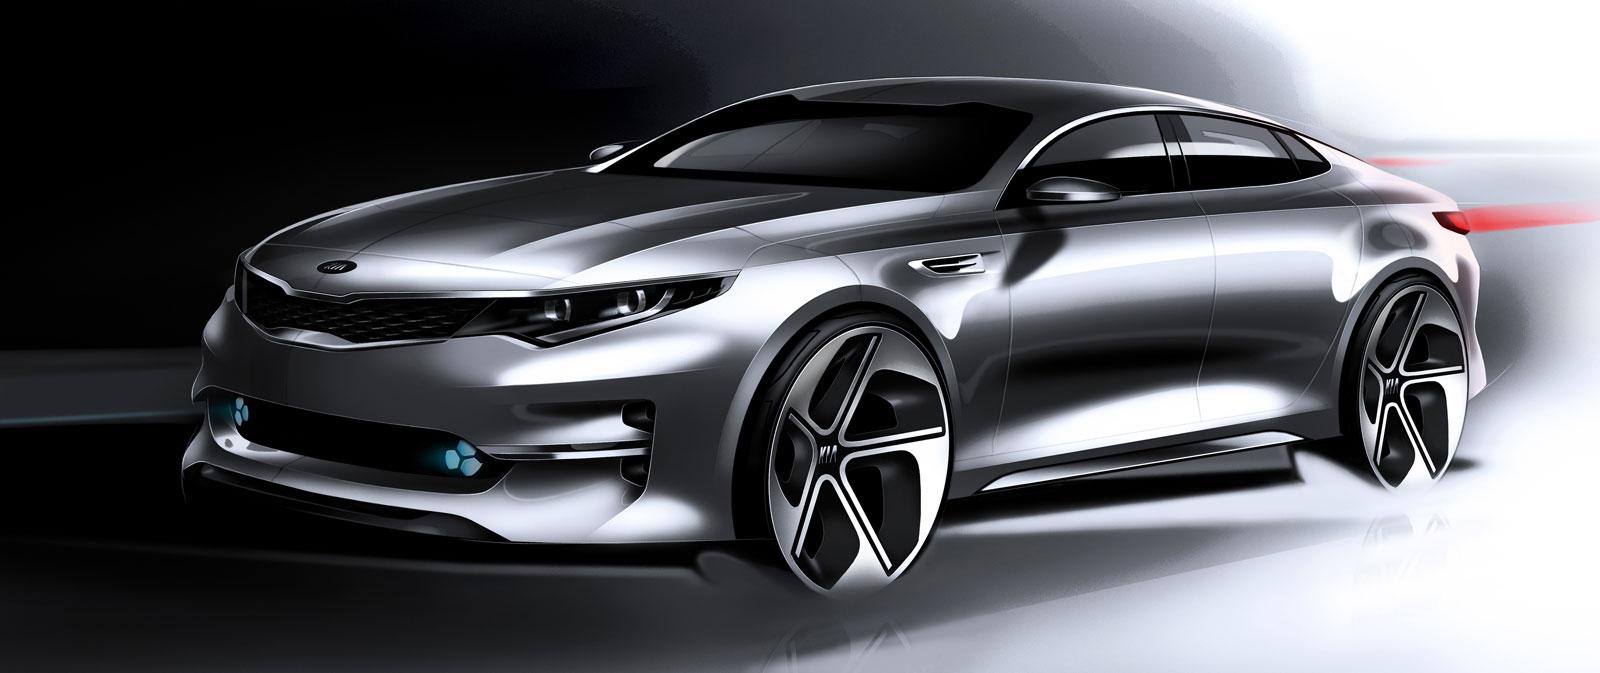 optima   design sketch render   car body design 498806 on wookmark